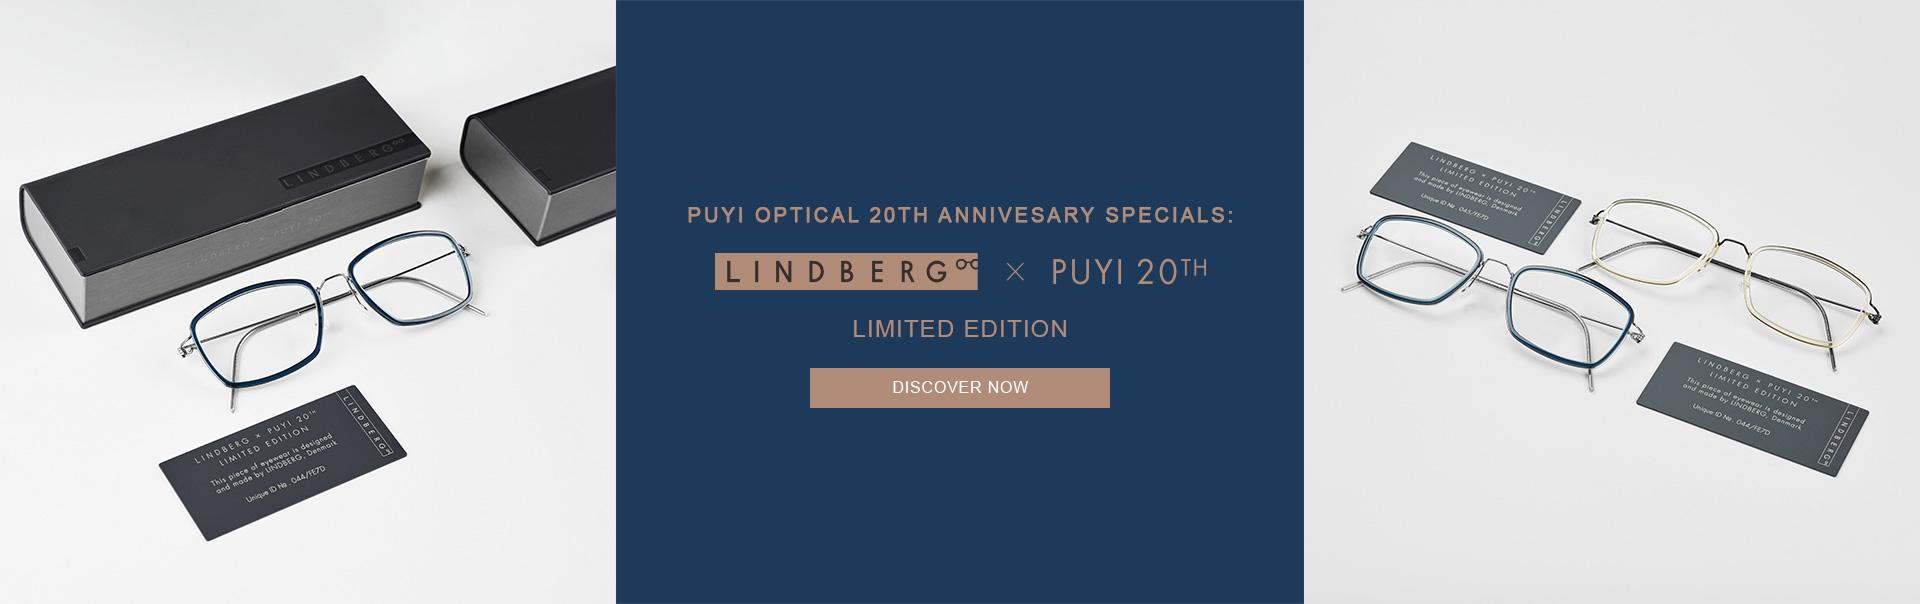 LINDBERG X PUYI 20TH LIMITED EDITION